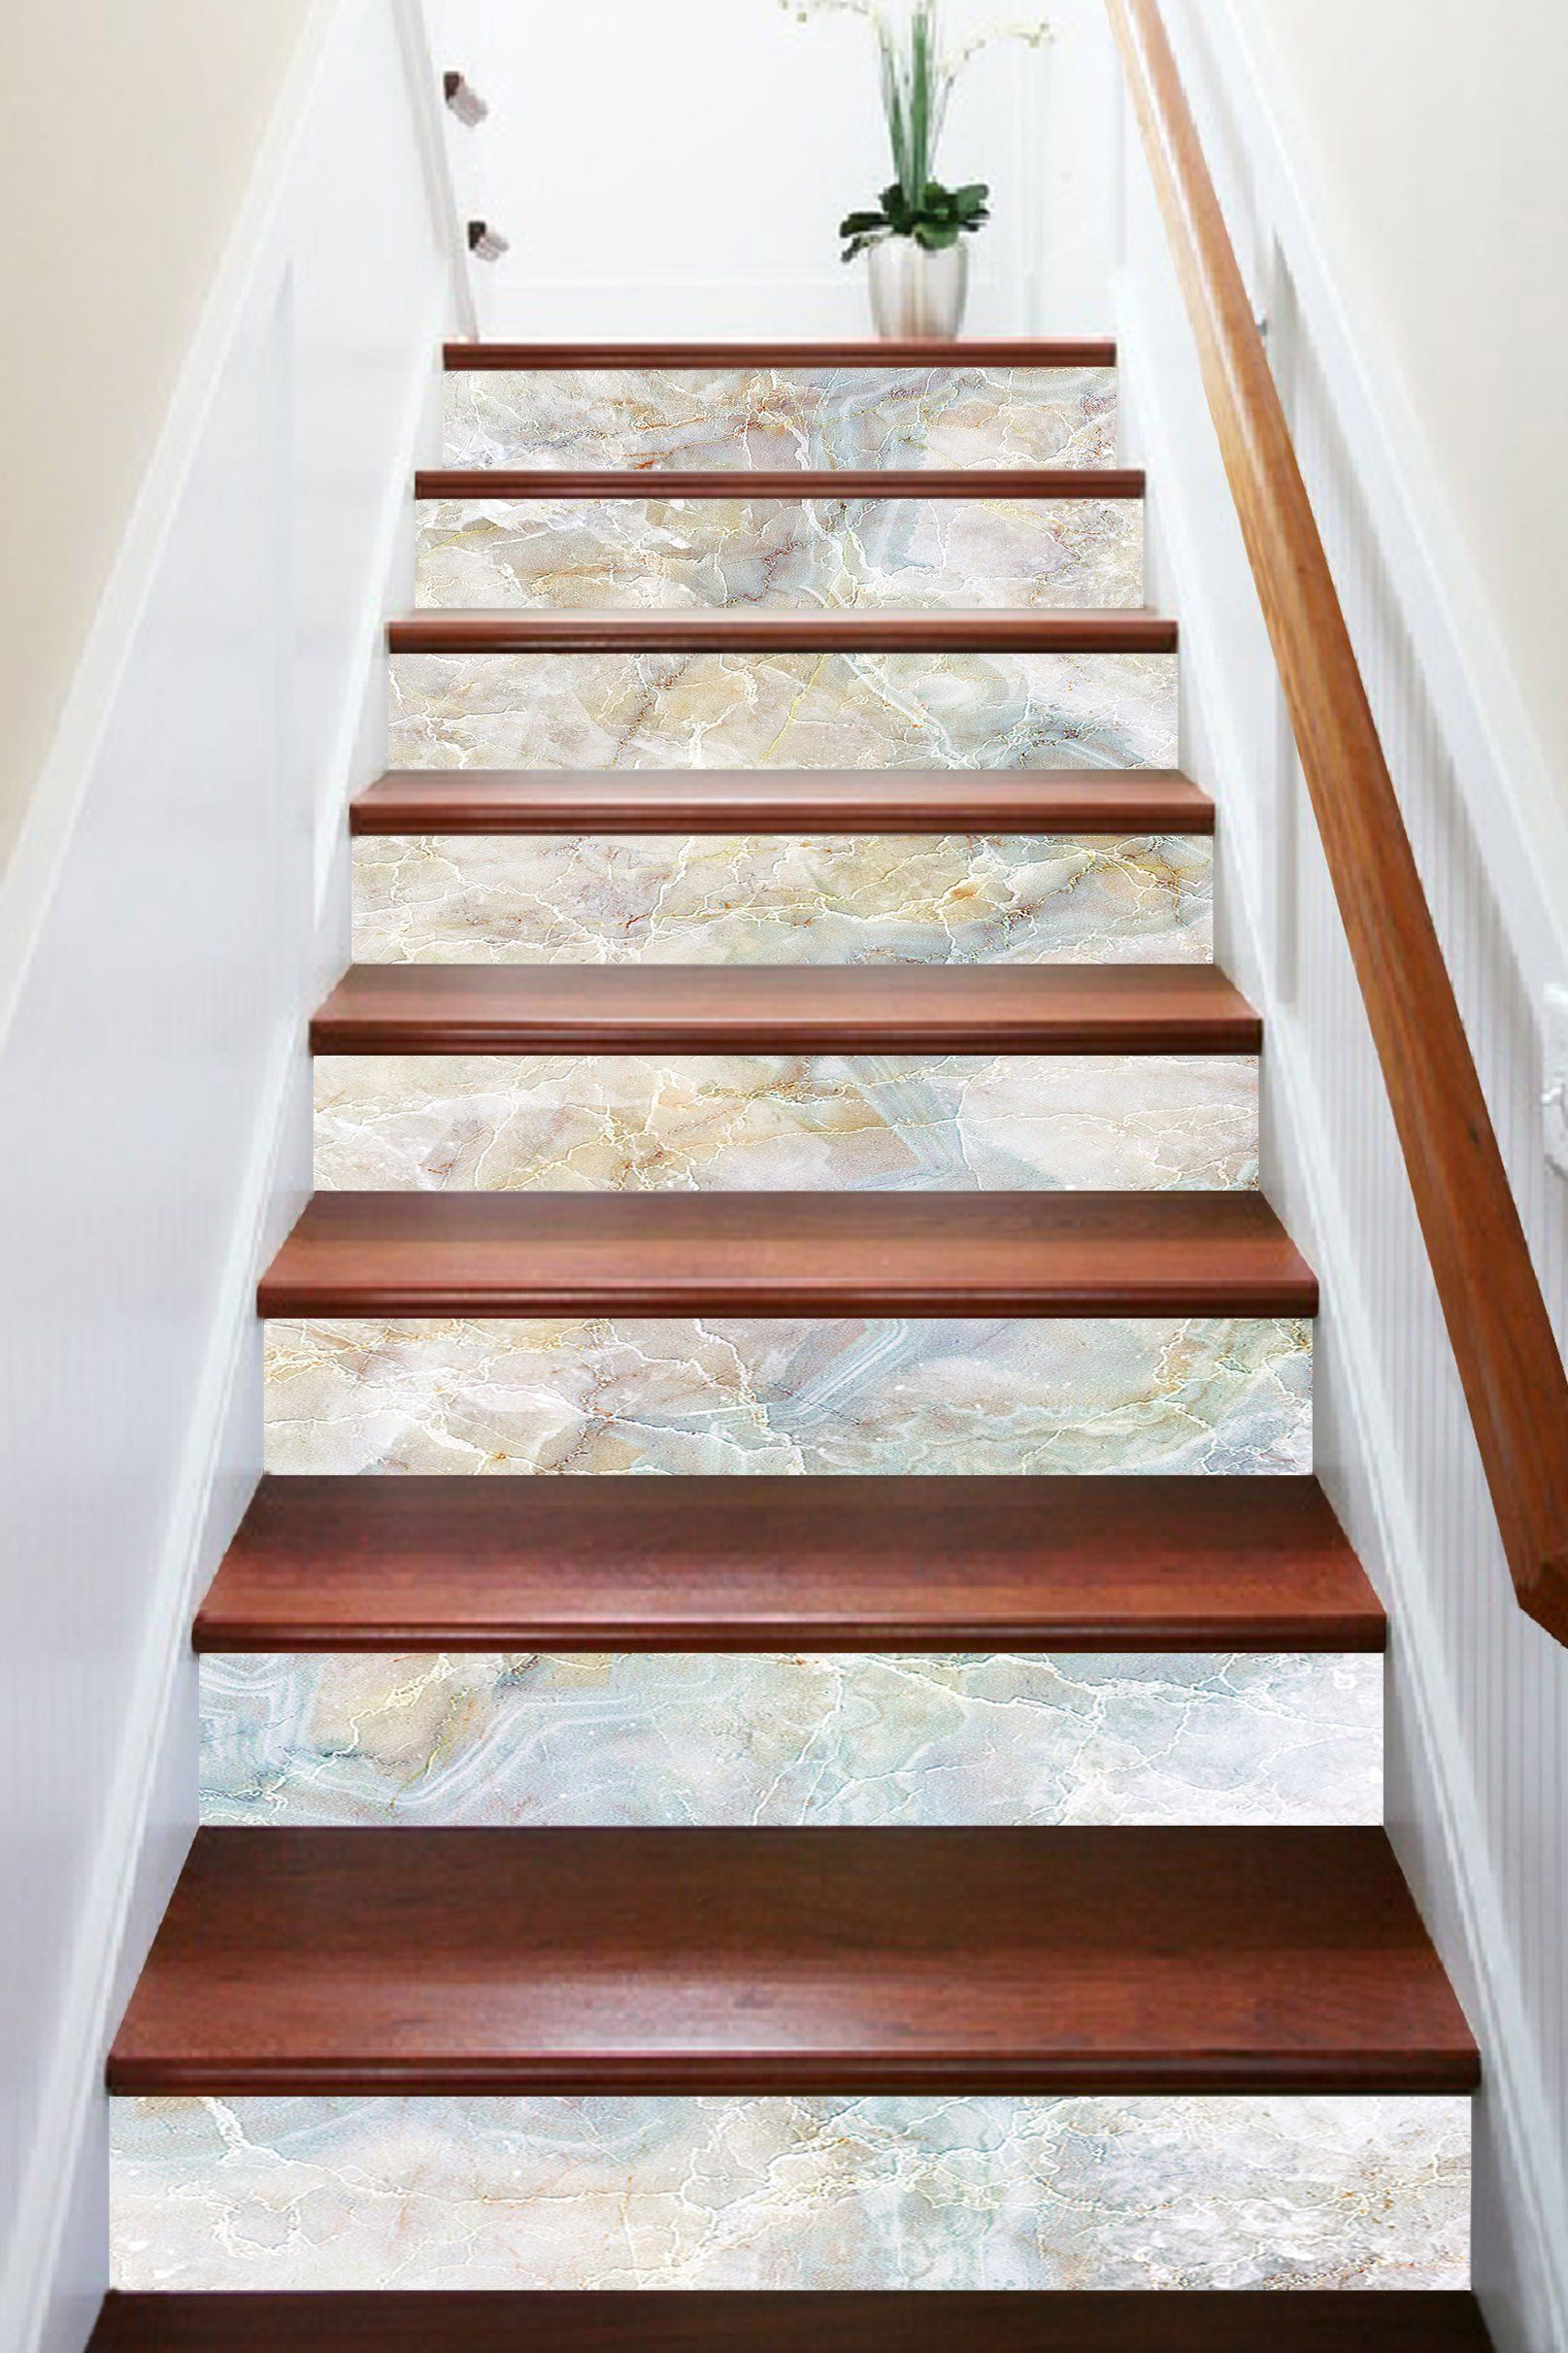 Best 3D Elegant Stone 433 Marble Tile Texture Stair Risers Stair Decor Stair Risers Tile Stairs 400 x 300